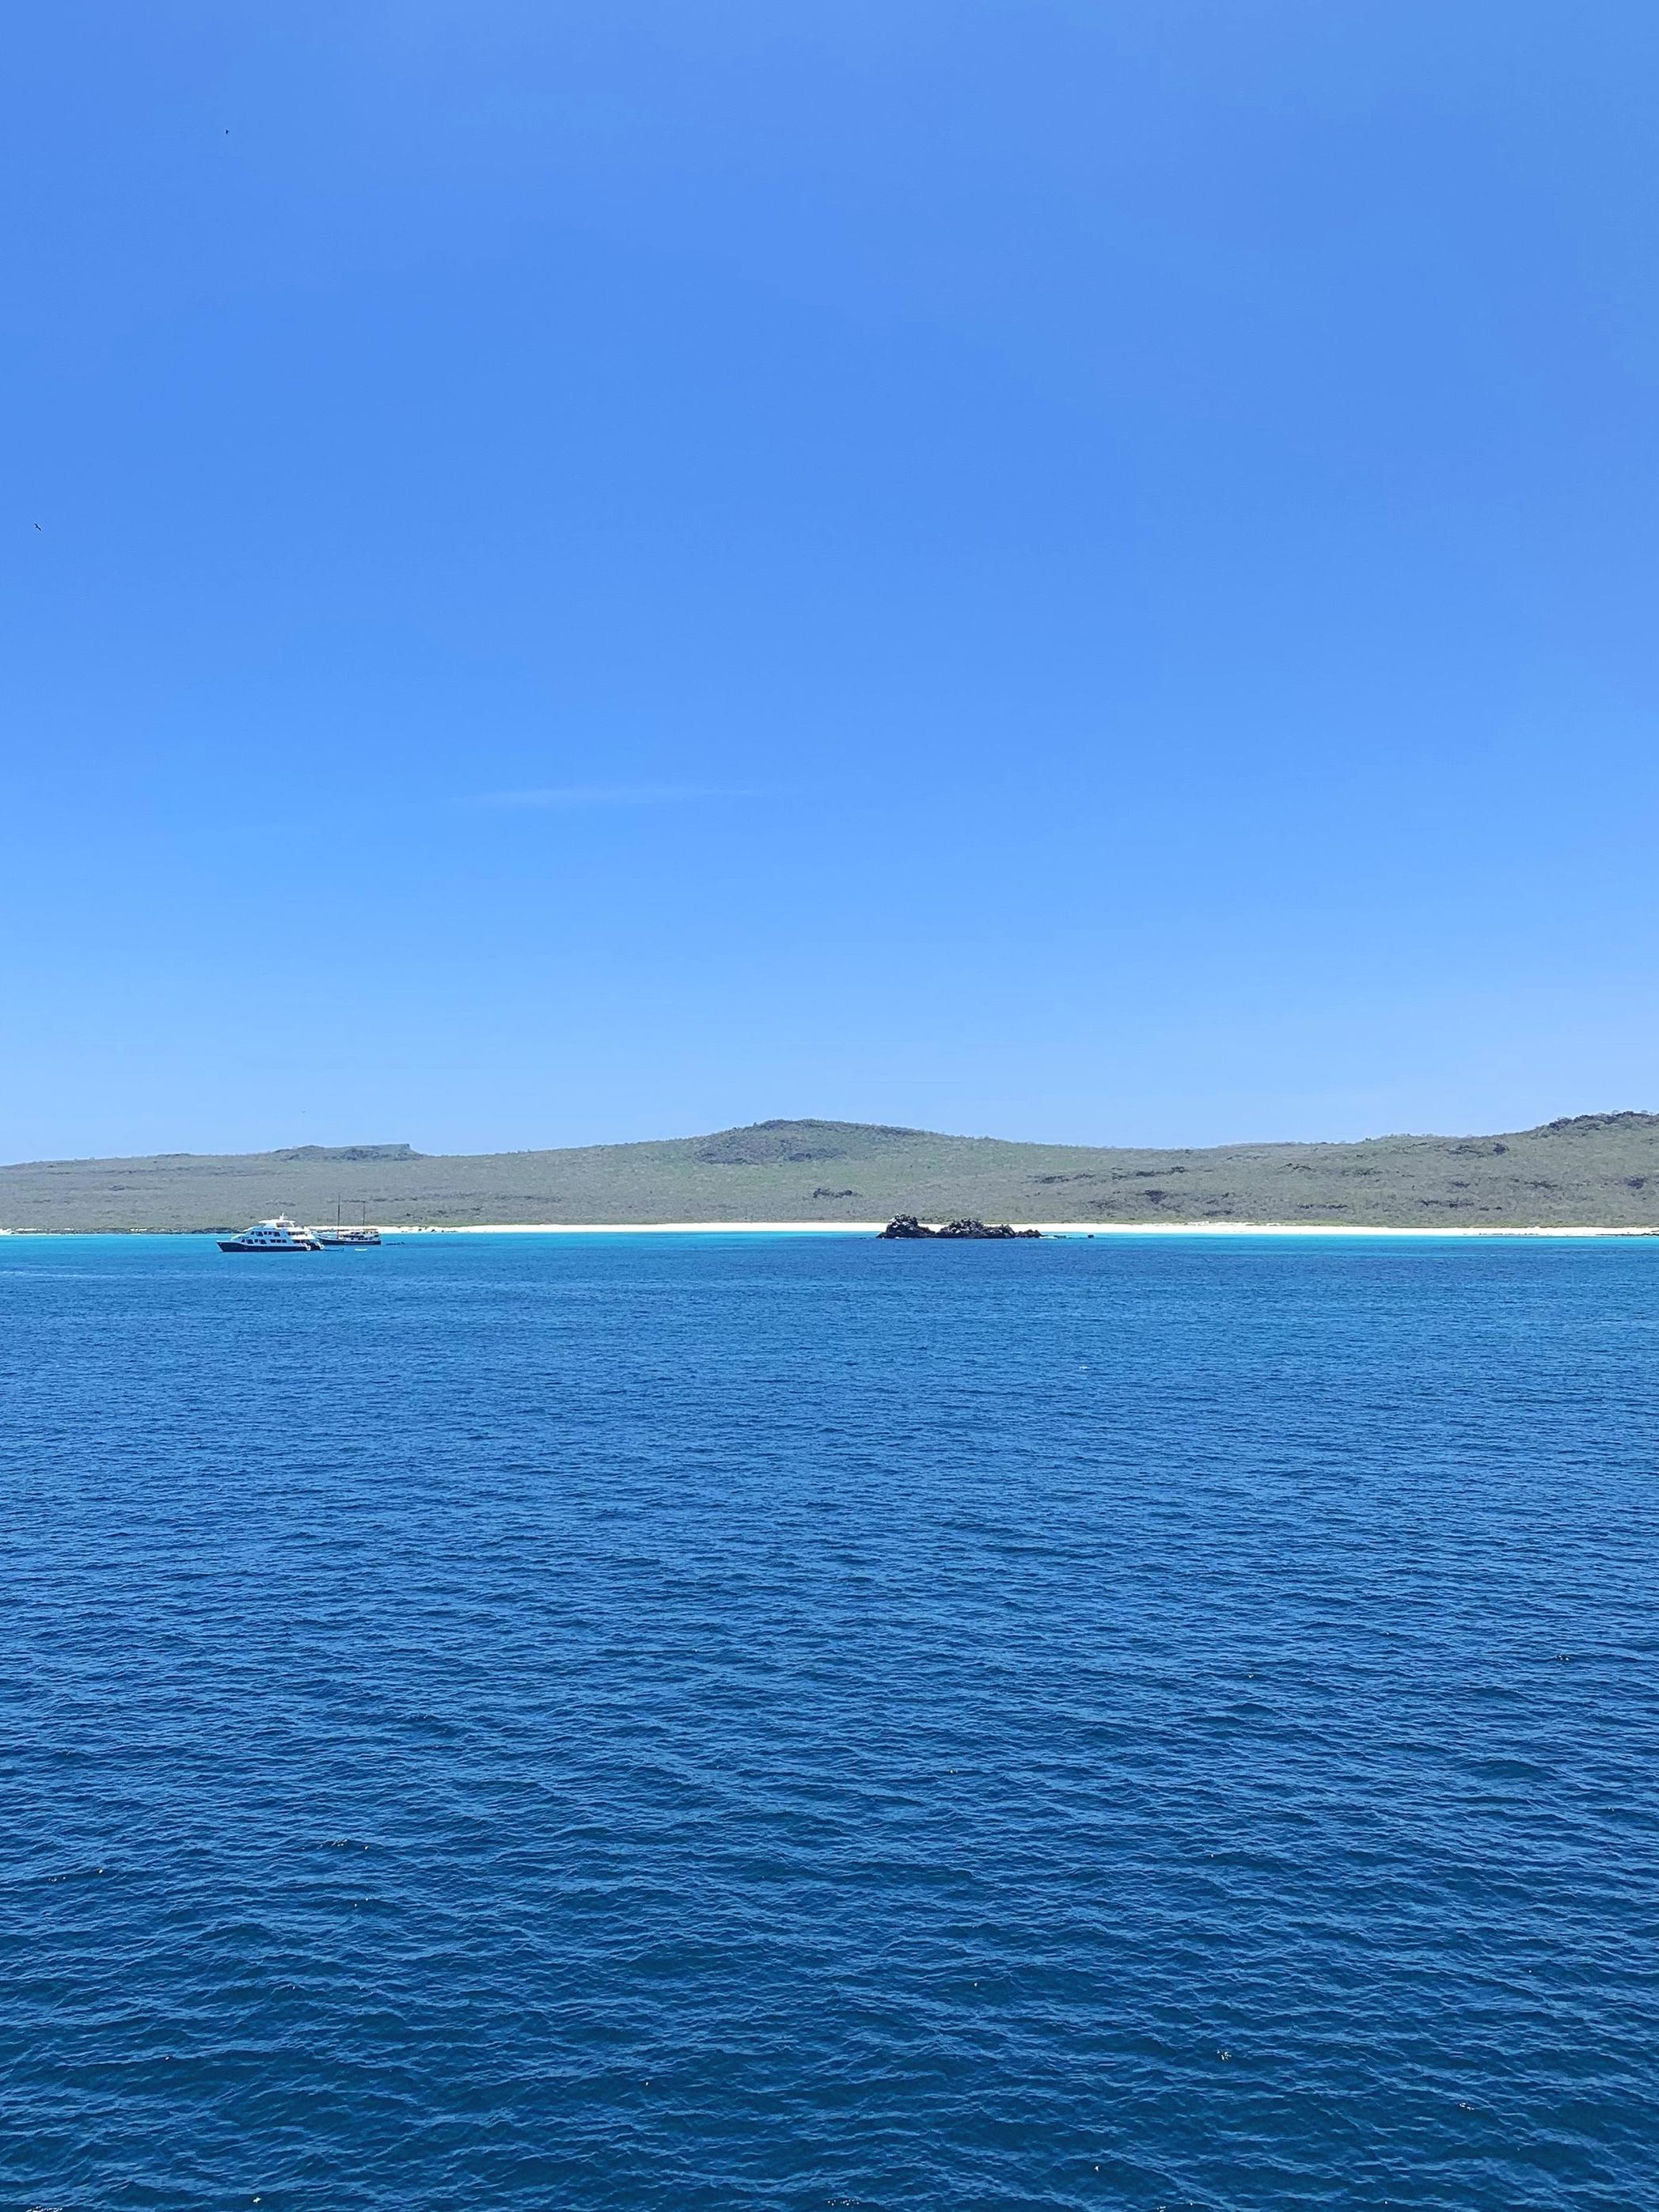 Gardner Bay viewed from the ship.